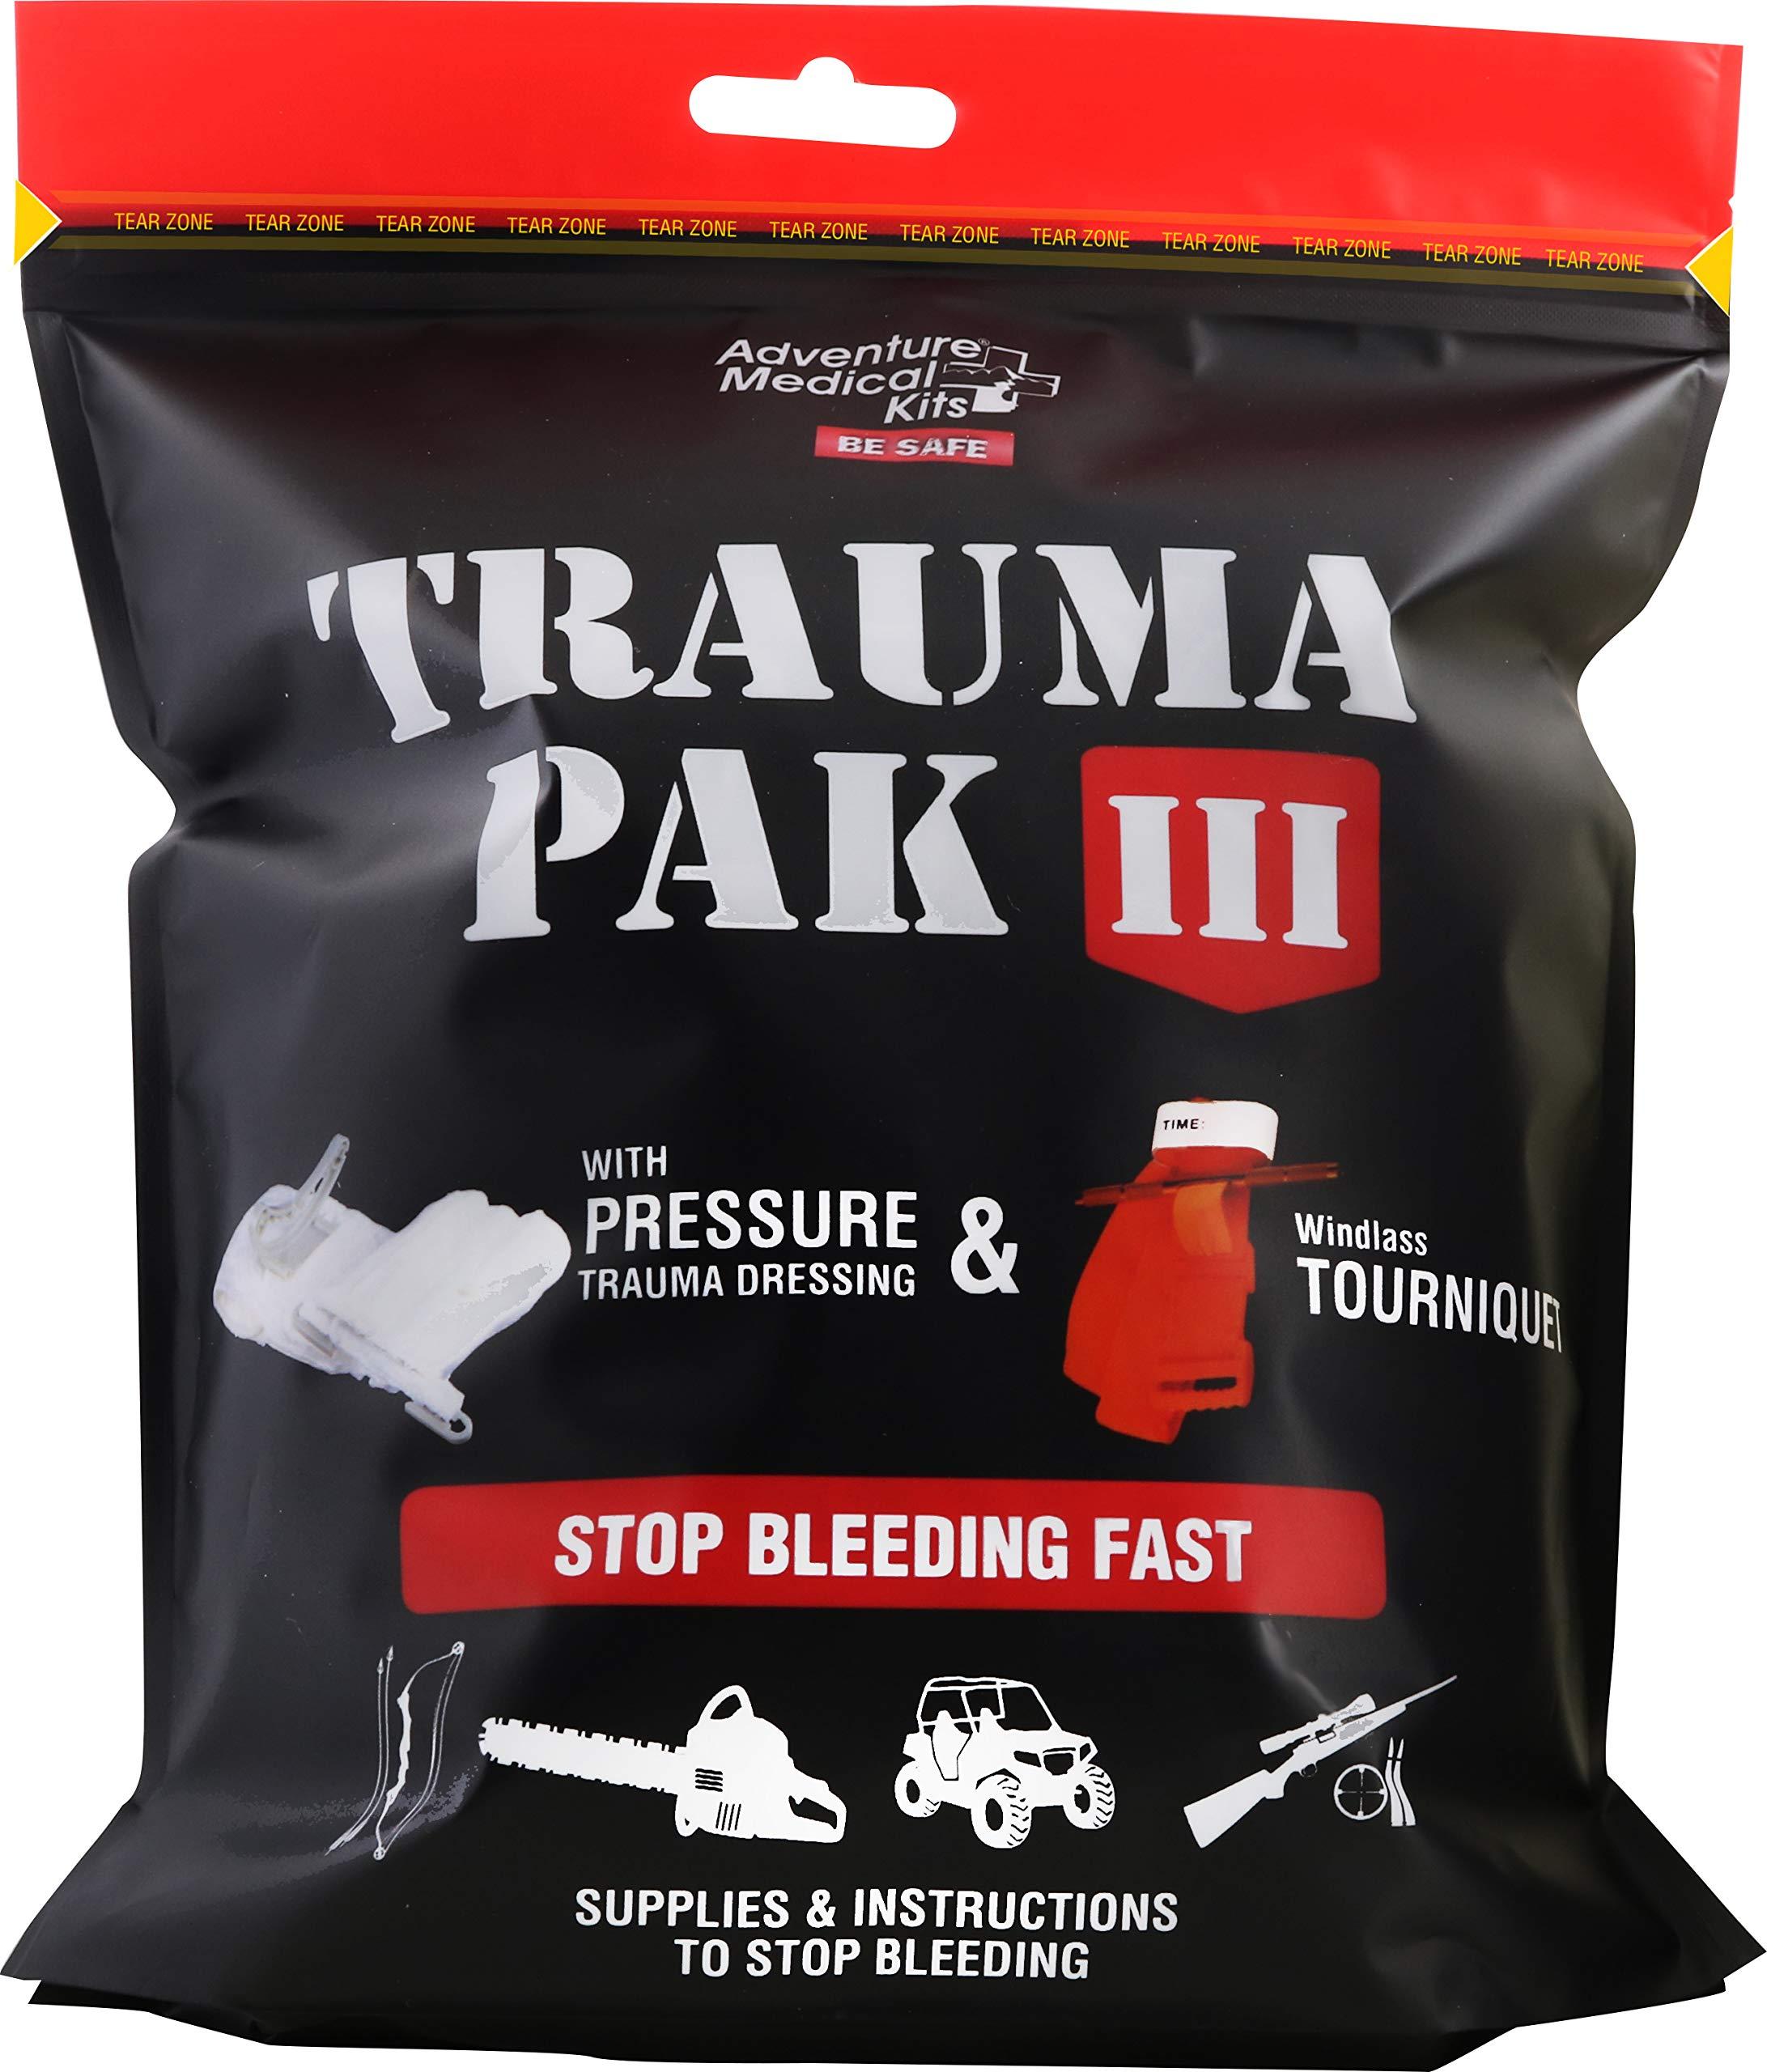 Adventure Medical Kits Trauma Pak 3 Emergency Field Kit with Advanced Clotting Sponge